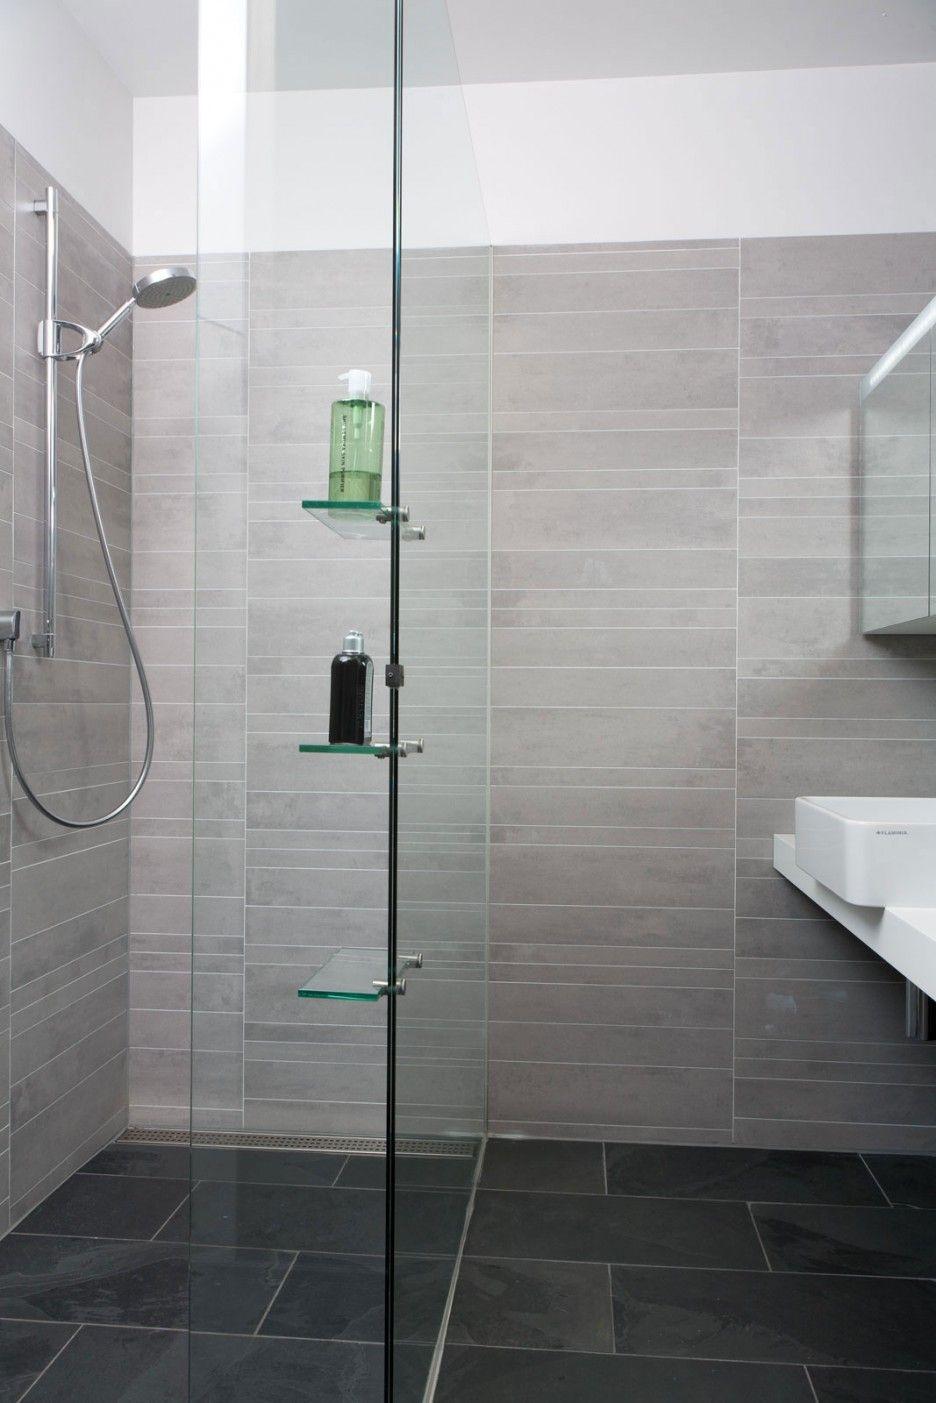 appealing modern bathroom tile designs   Admirable Modern Apartment Design: River Ij Apartment ...